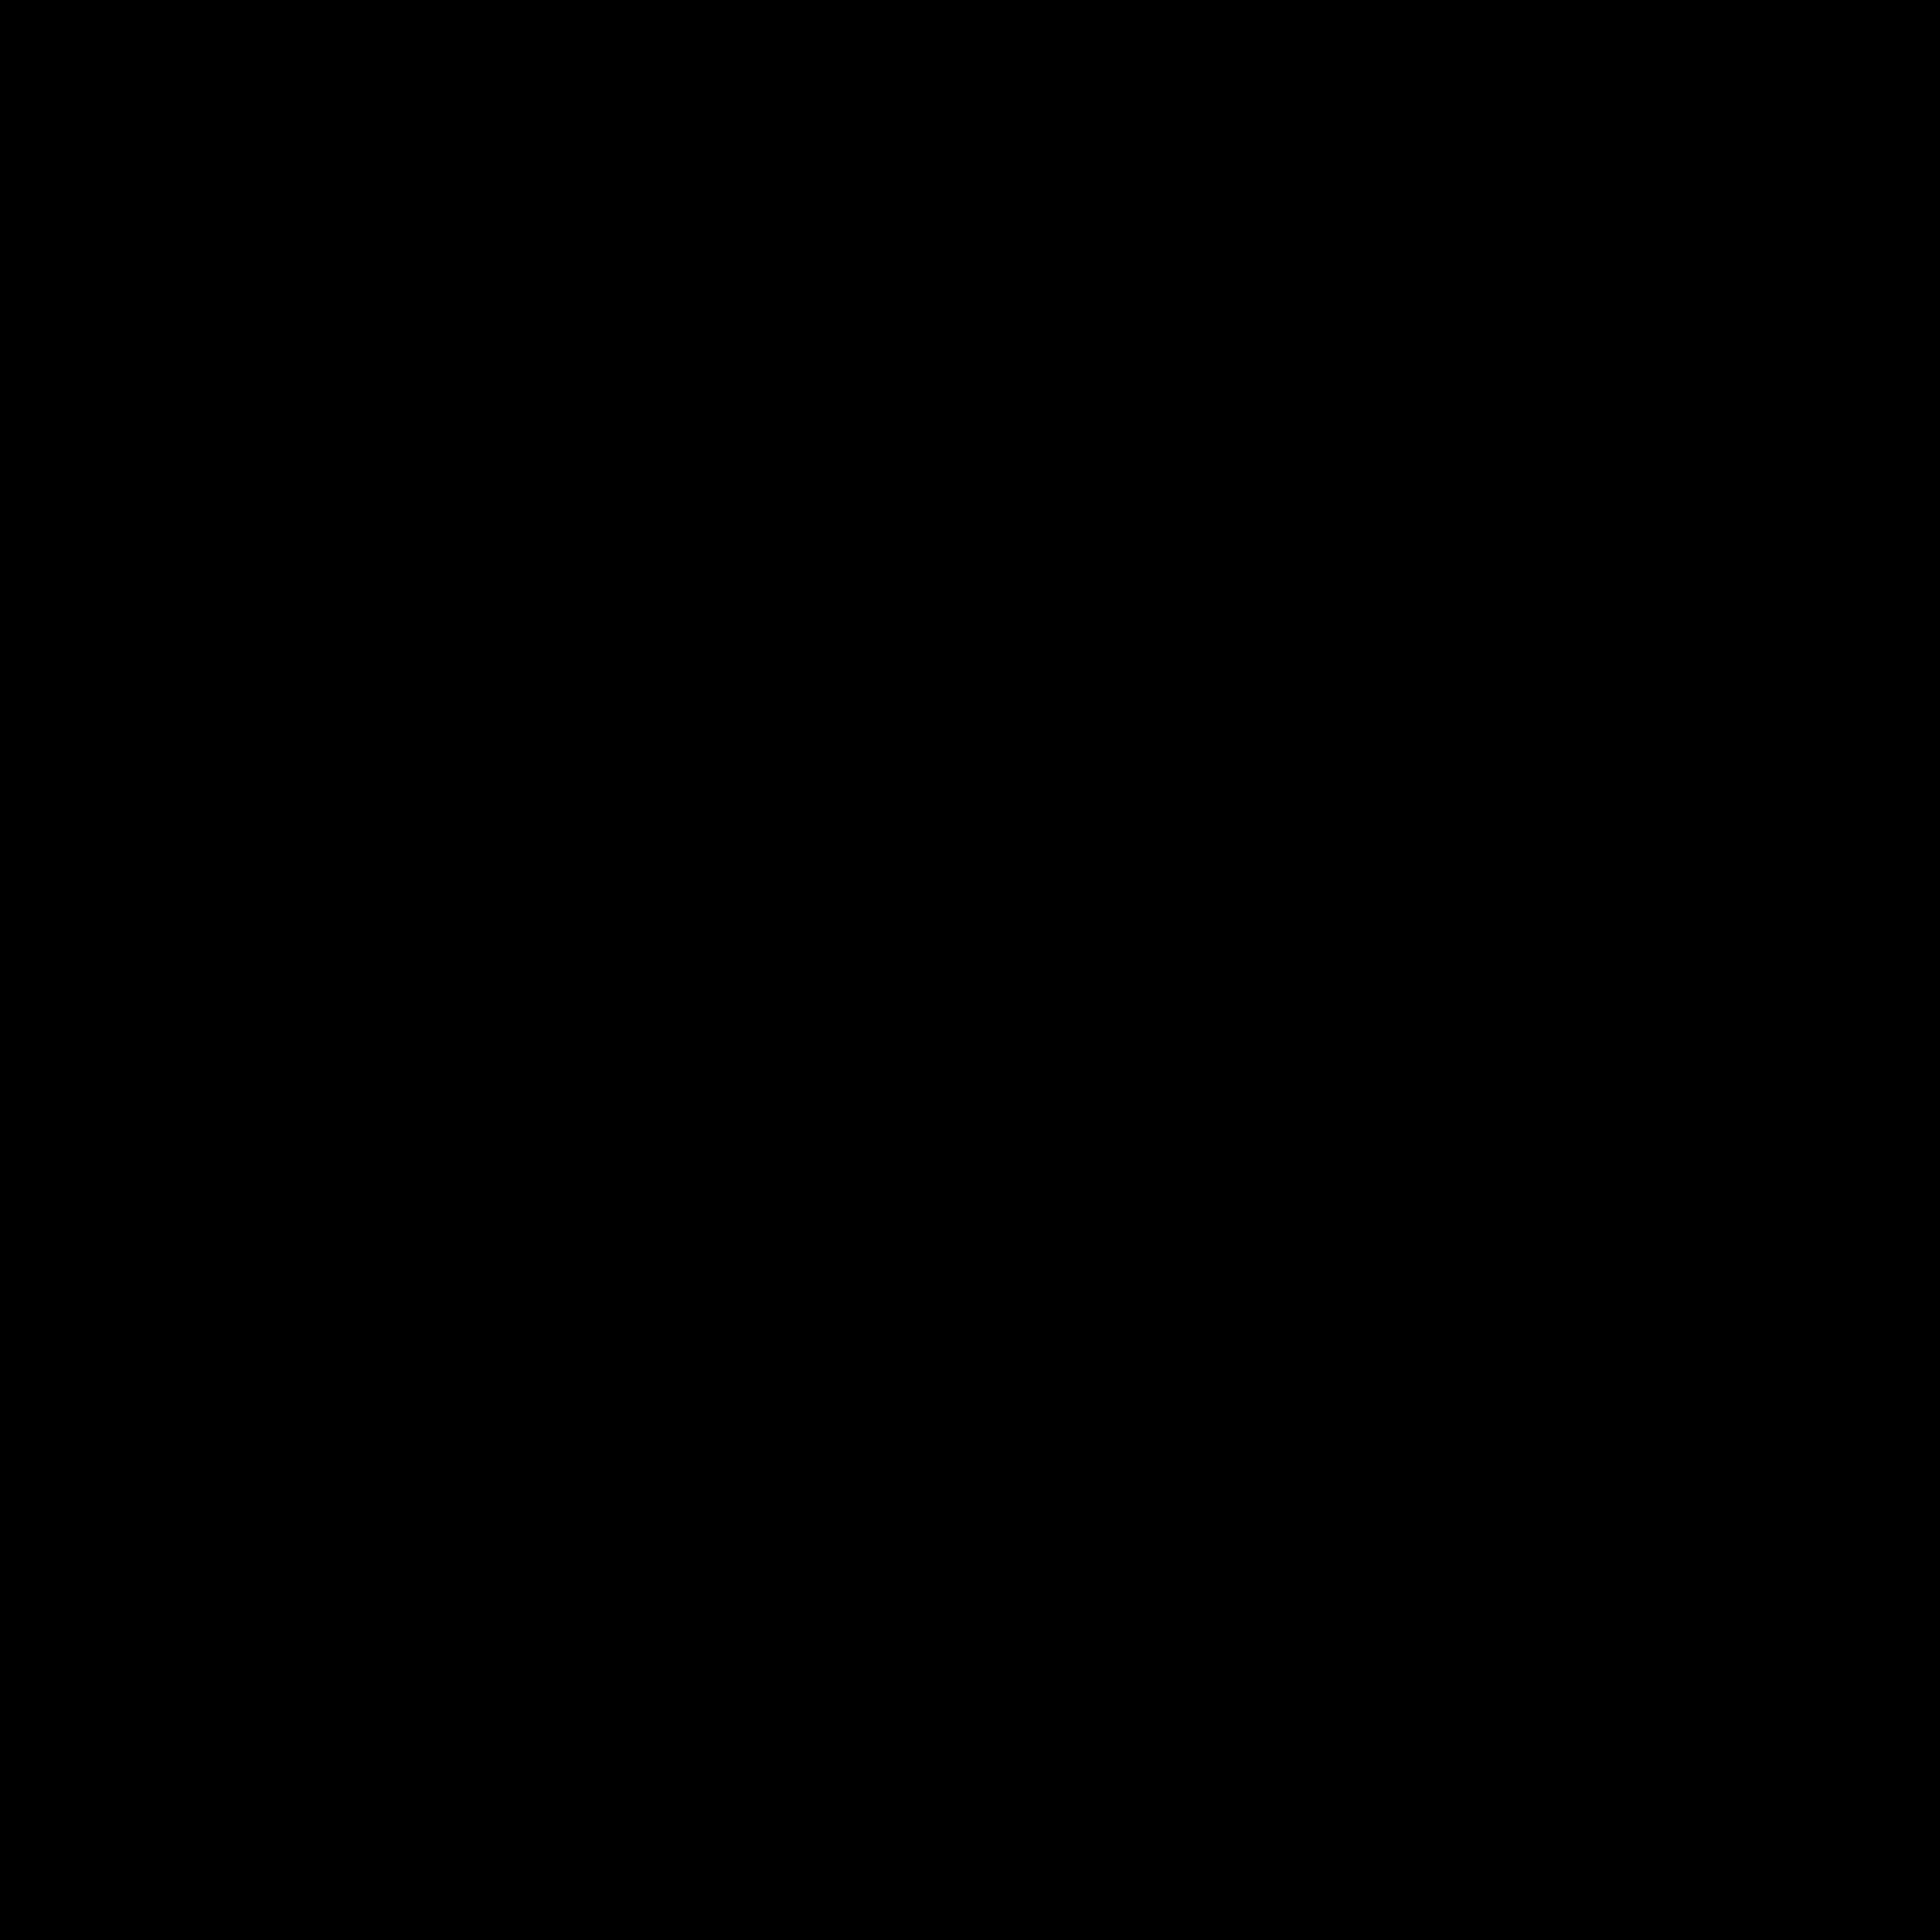 timberland logo 0 - Timberland Logo